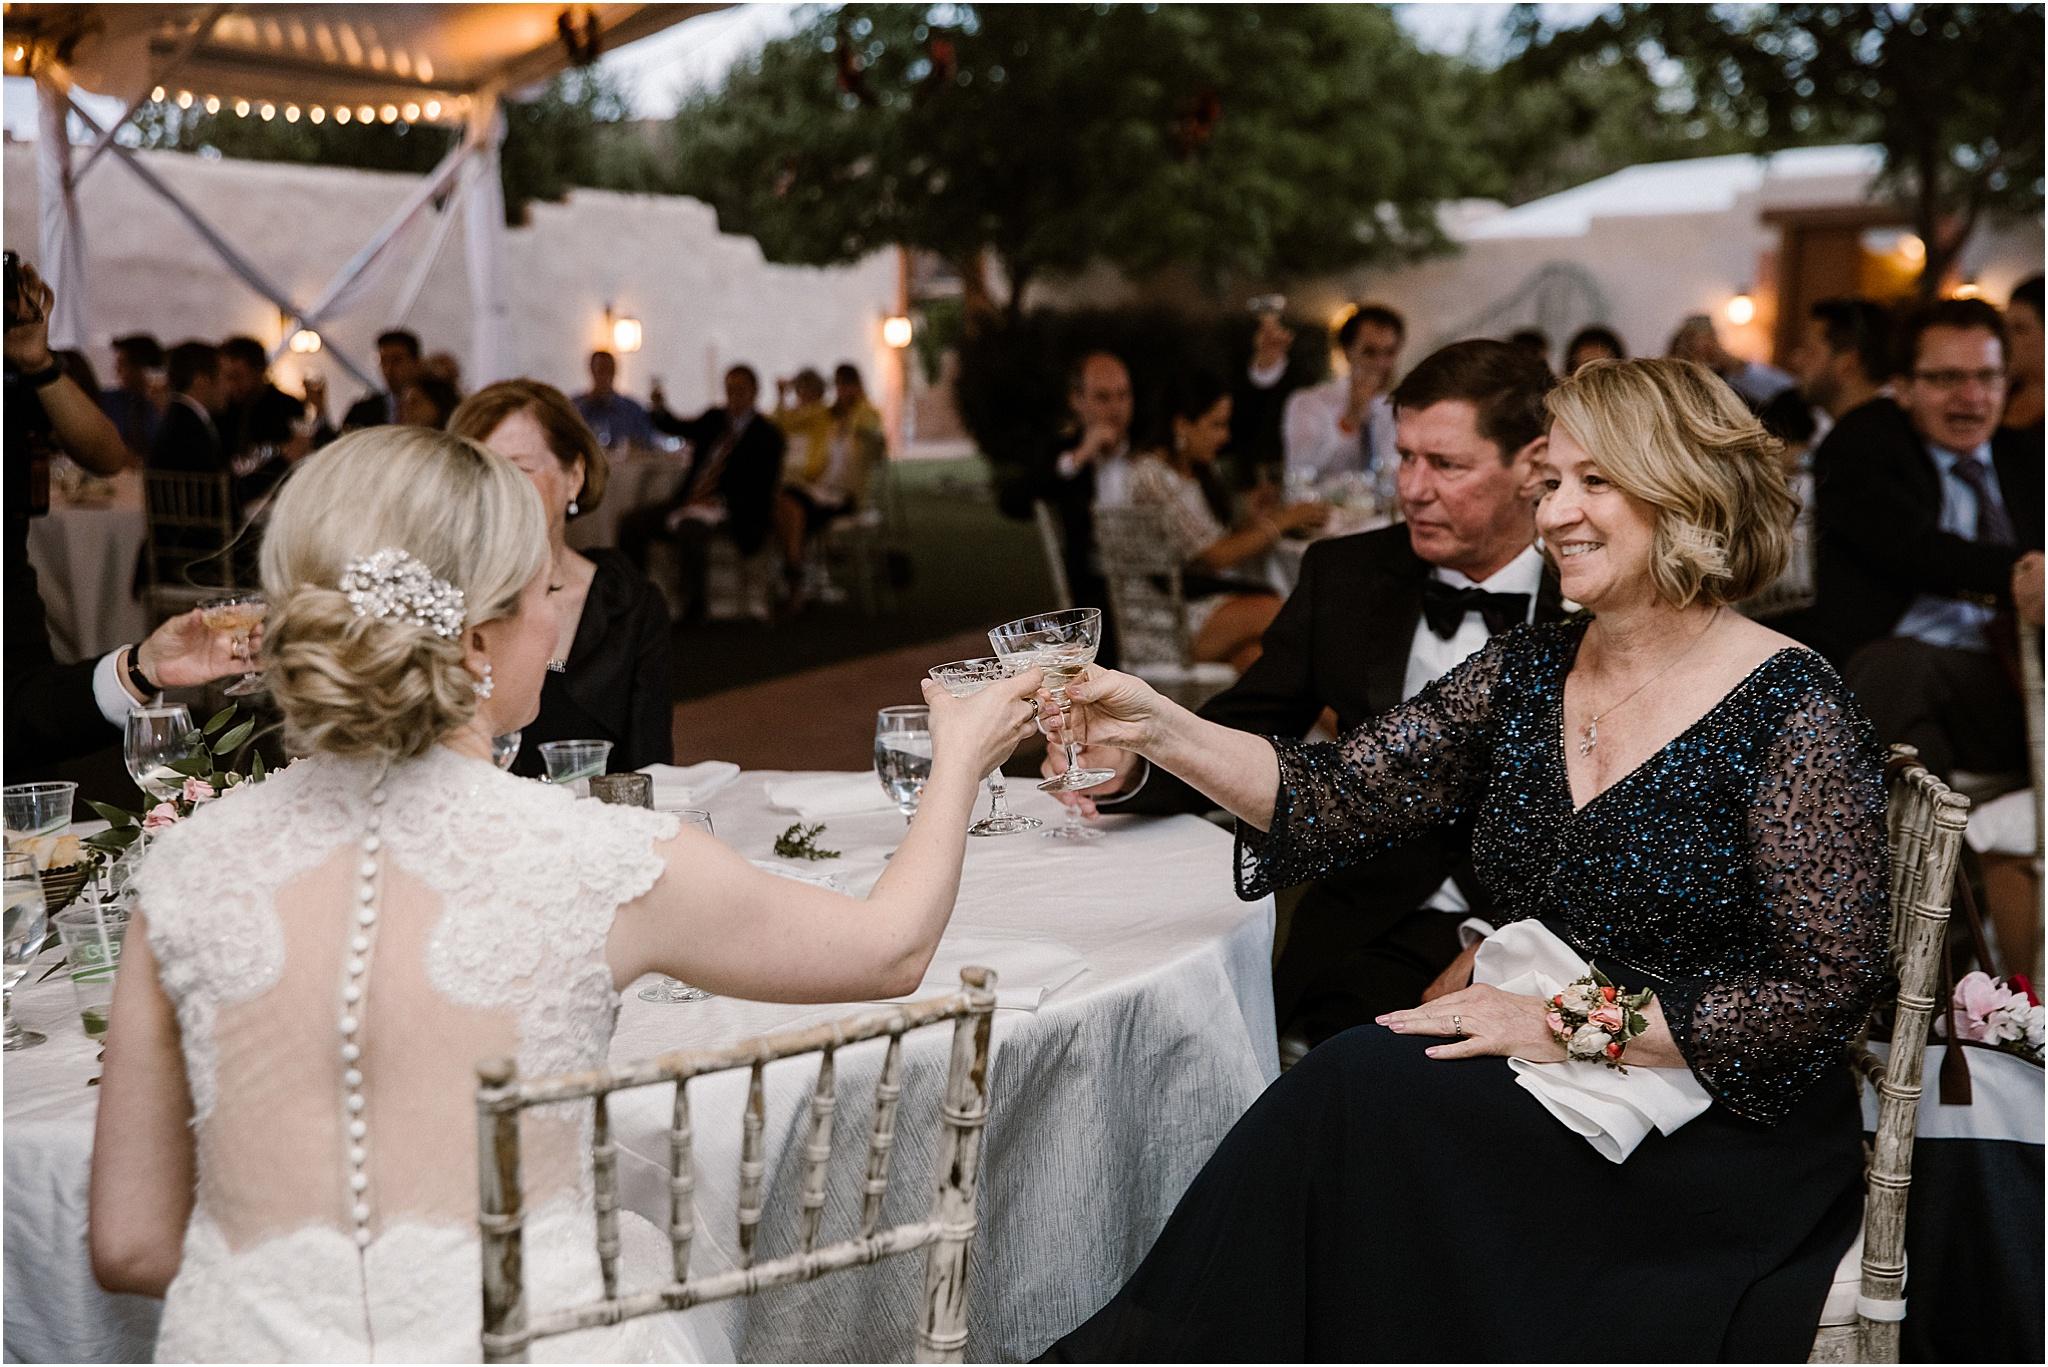 JENNA_JEROME_BLUE ROSE PHOTOGRAPHY_ABQ WEDDING_61